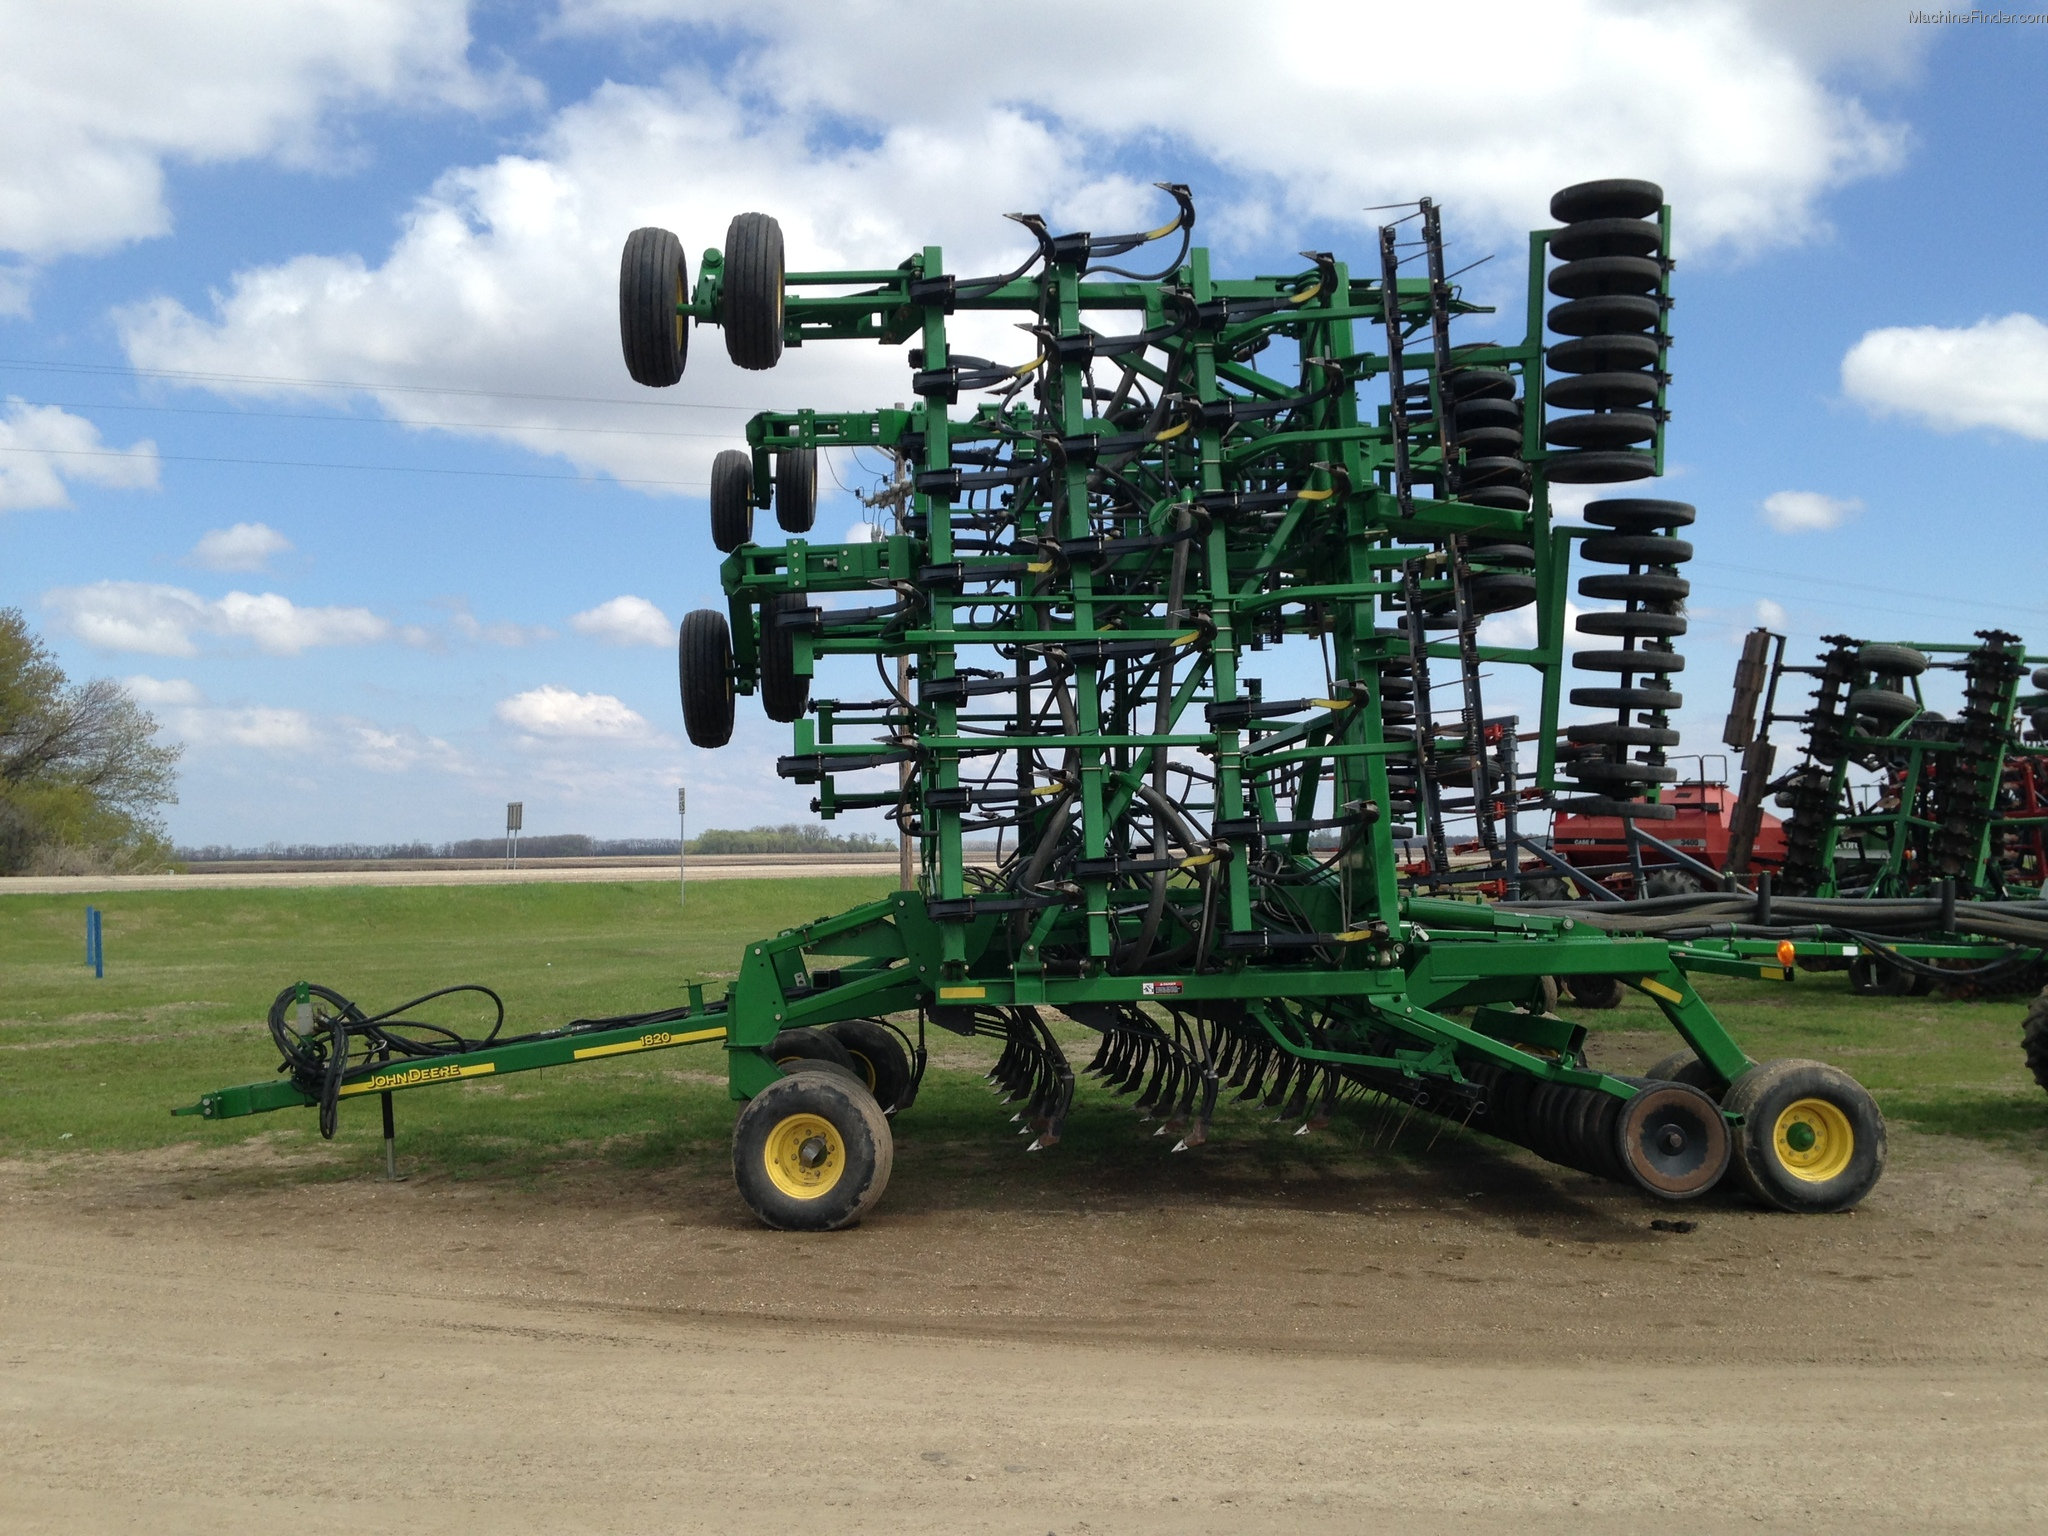 2005 John Deere 1820 Planting & Seeding - Air Drills ...